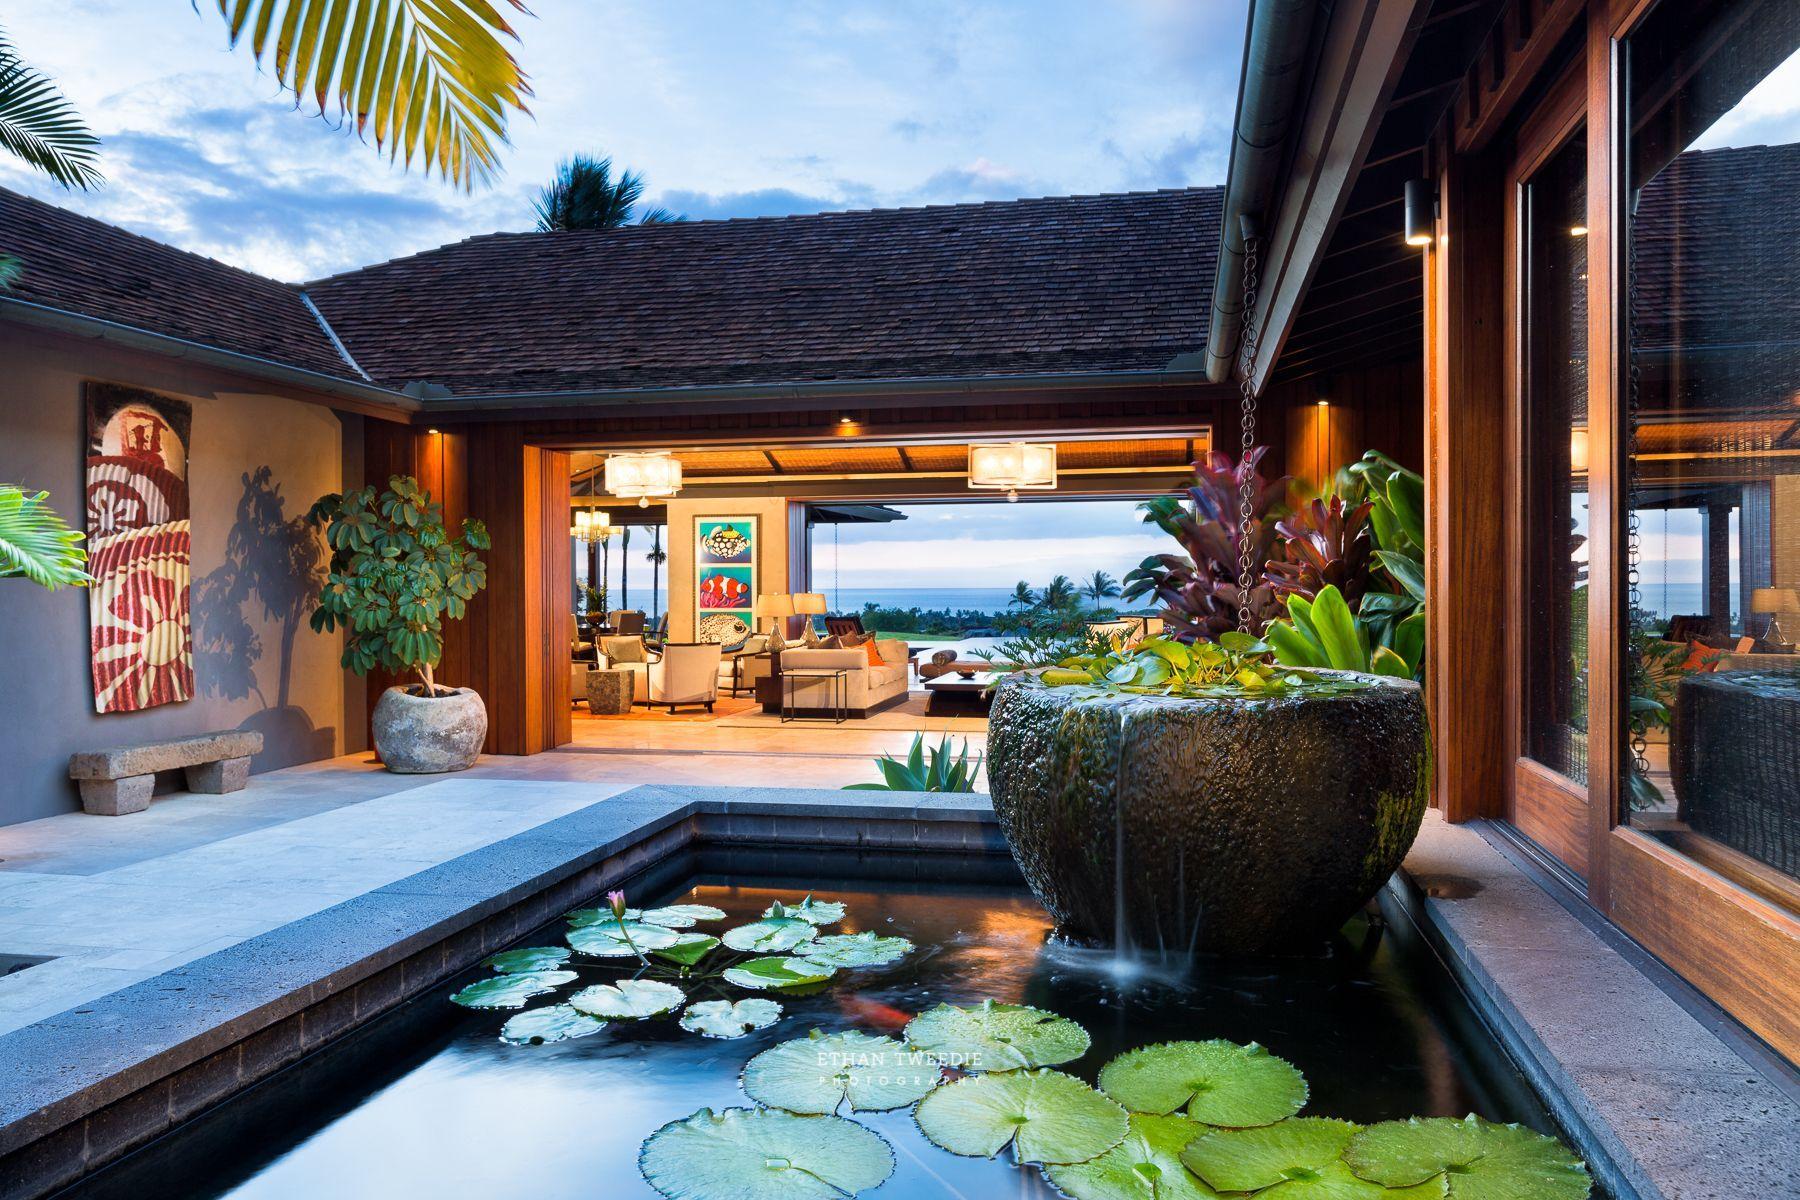 Luxury Real Estate Big Island Hawaii Hualalai Four Seasons Hualalai Interior Design Photography Vacation Ren Courtyard House Plans Bali House Architecture